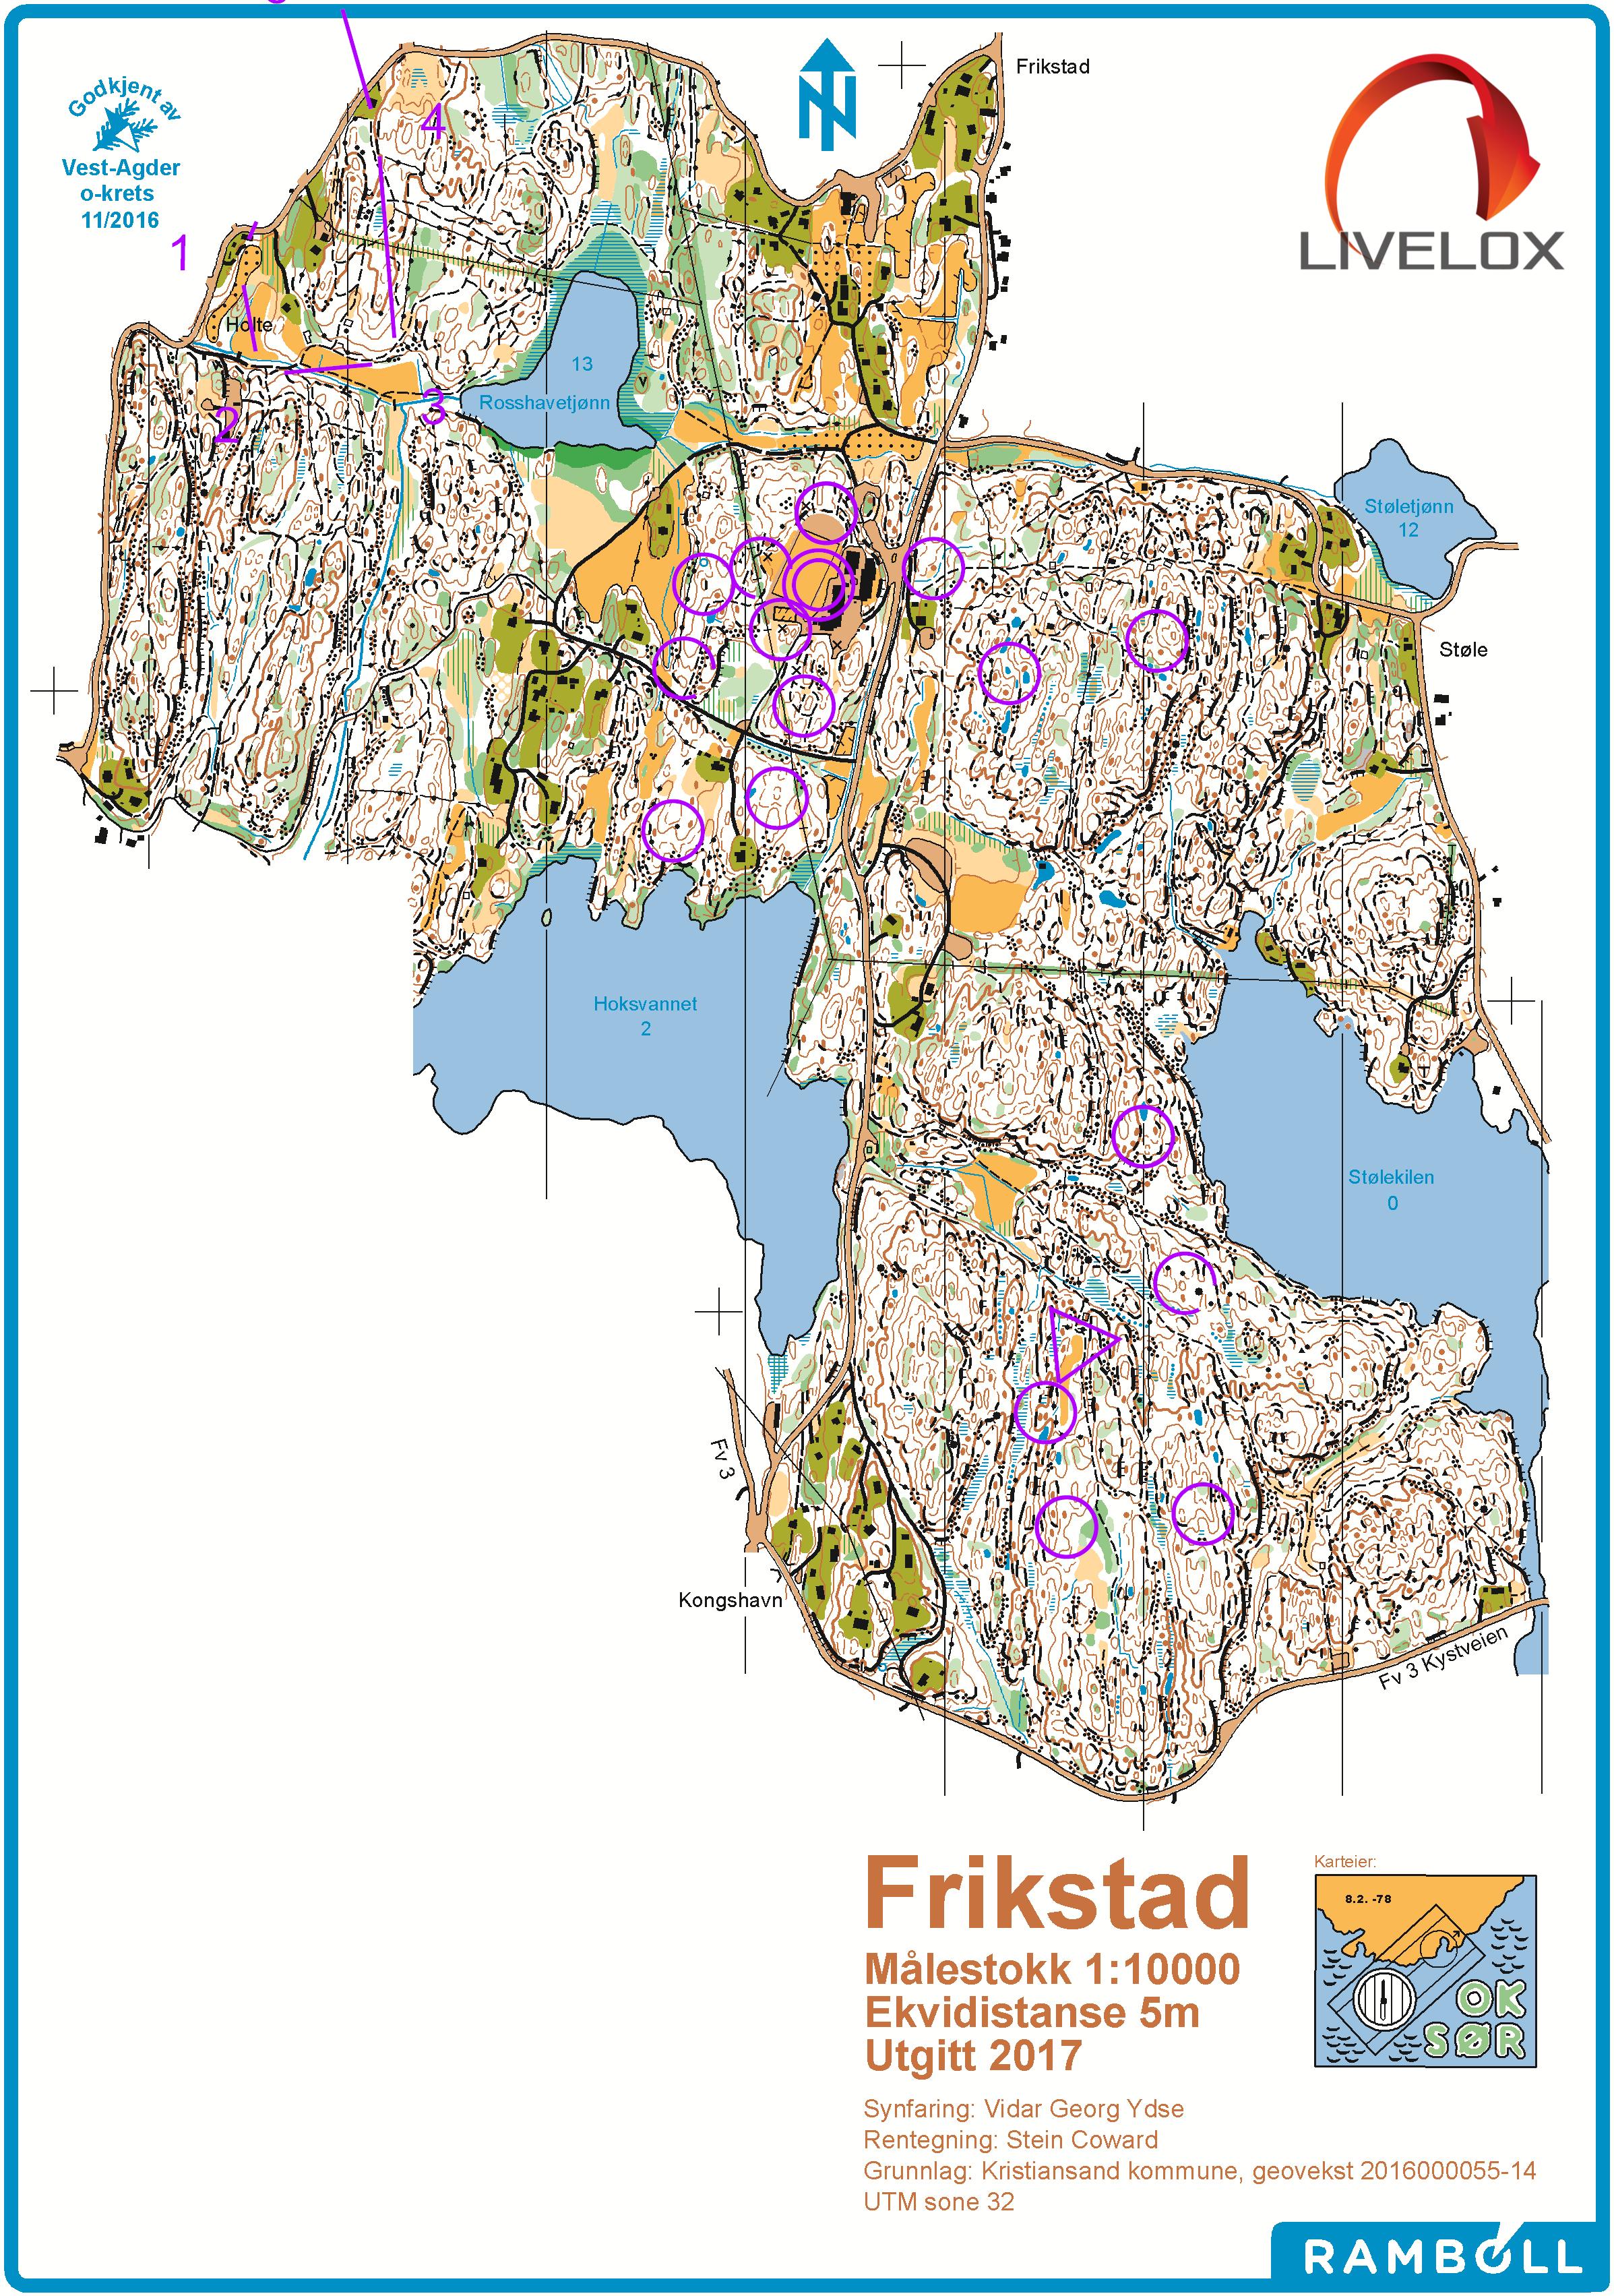 NC 1 Kristiansand (02.04.2017)